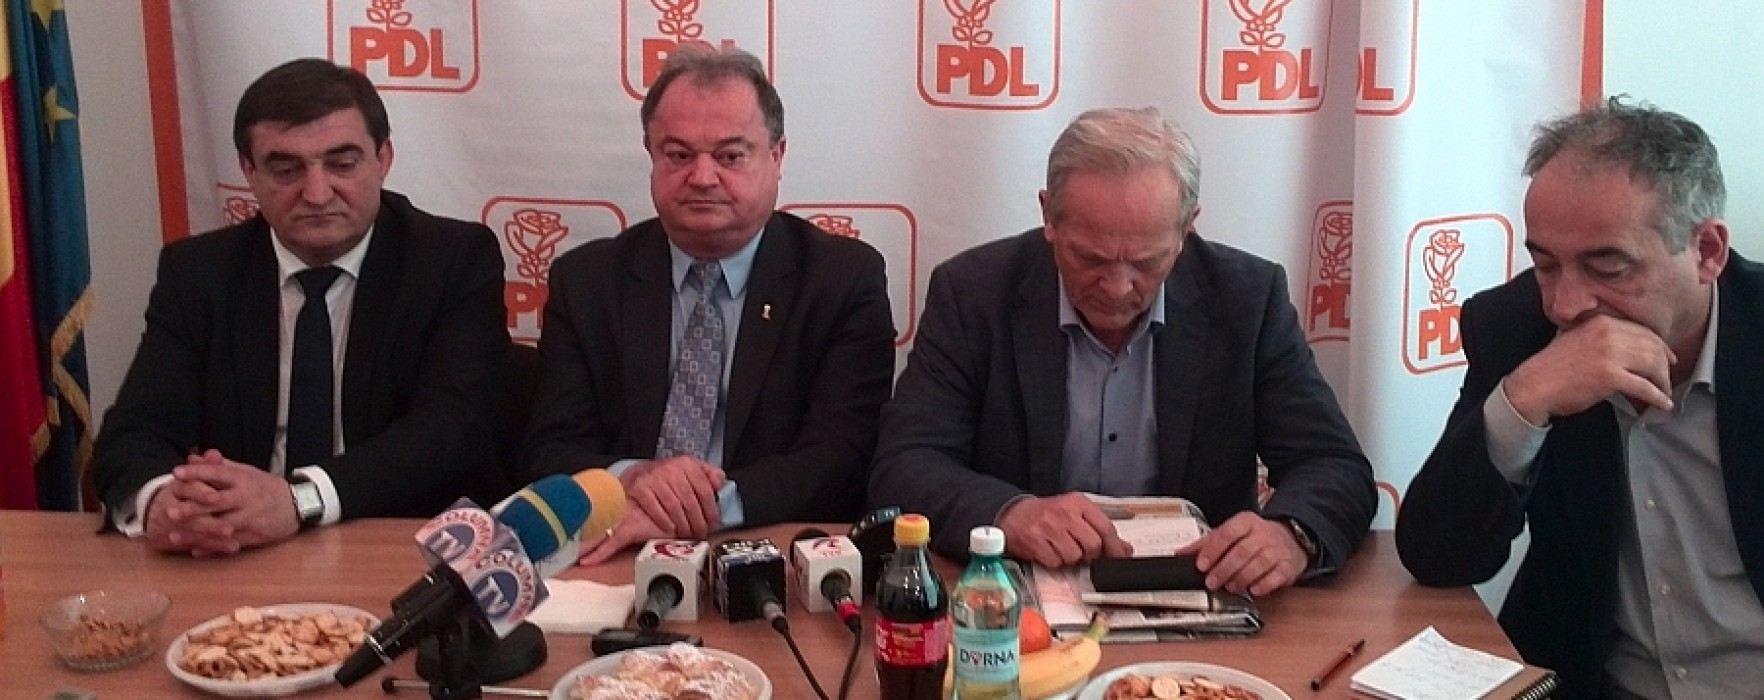 Vasile Blaga: Florin Popescu a lăsat datorii mari la PDL